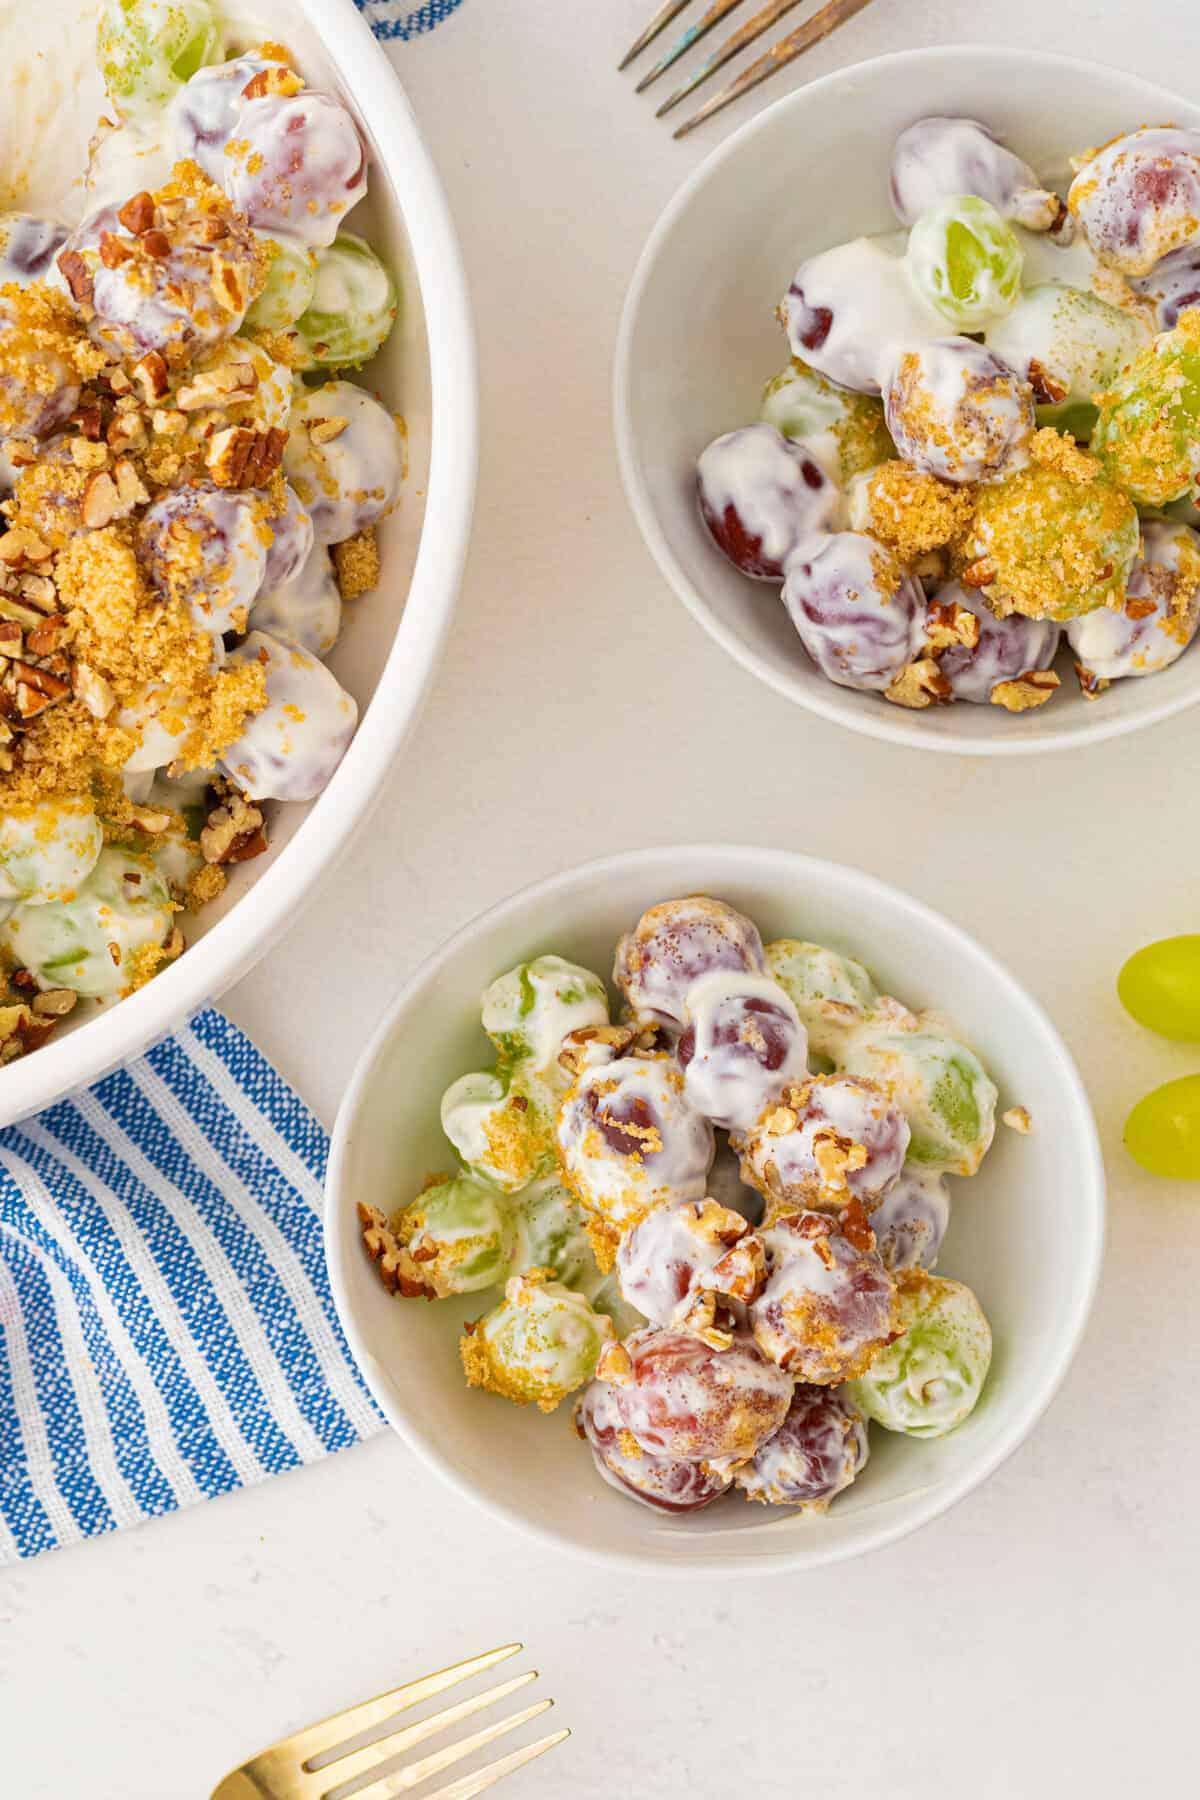 grape salad in white bowls